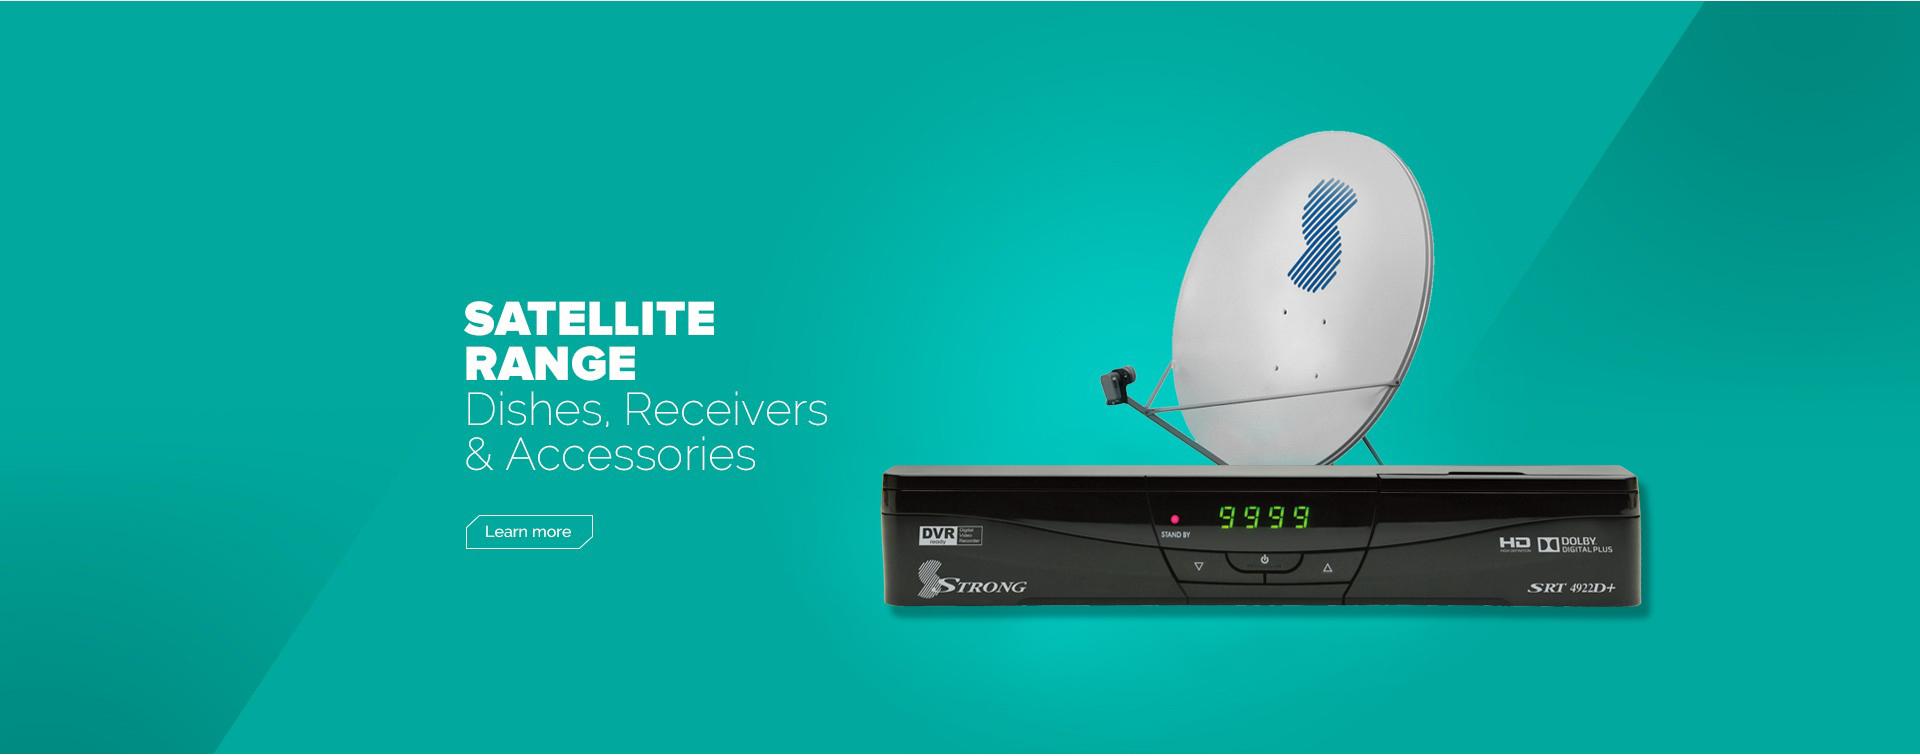 Satellite Range